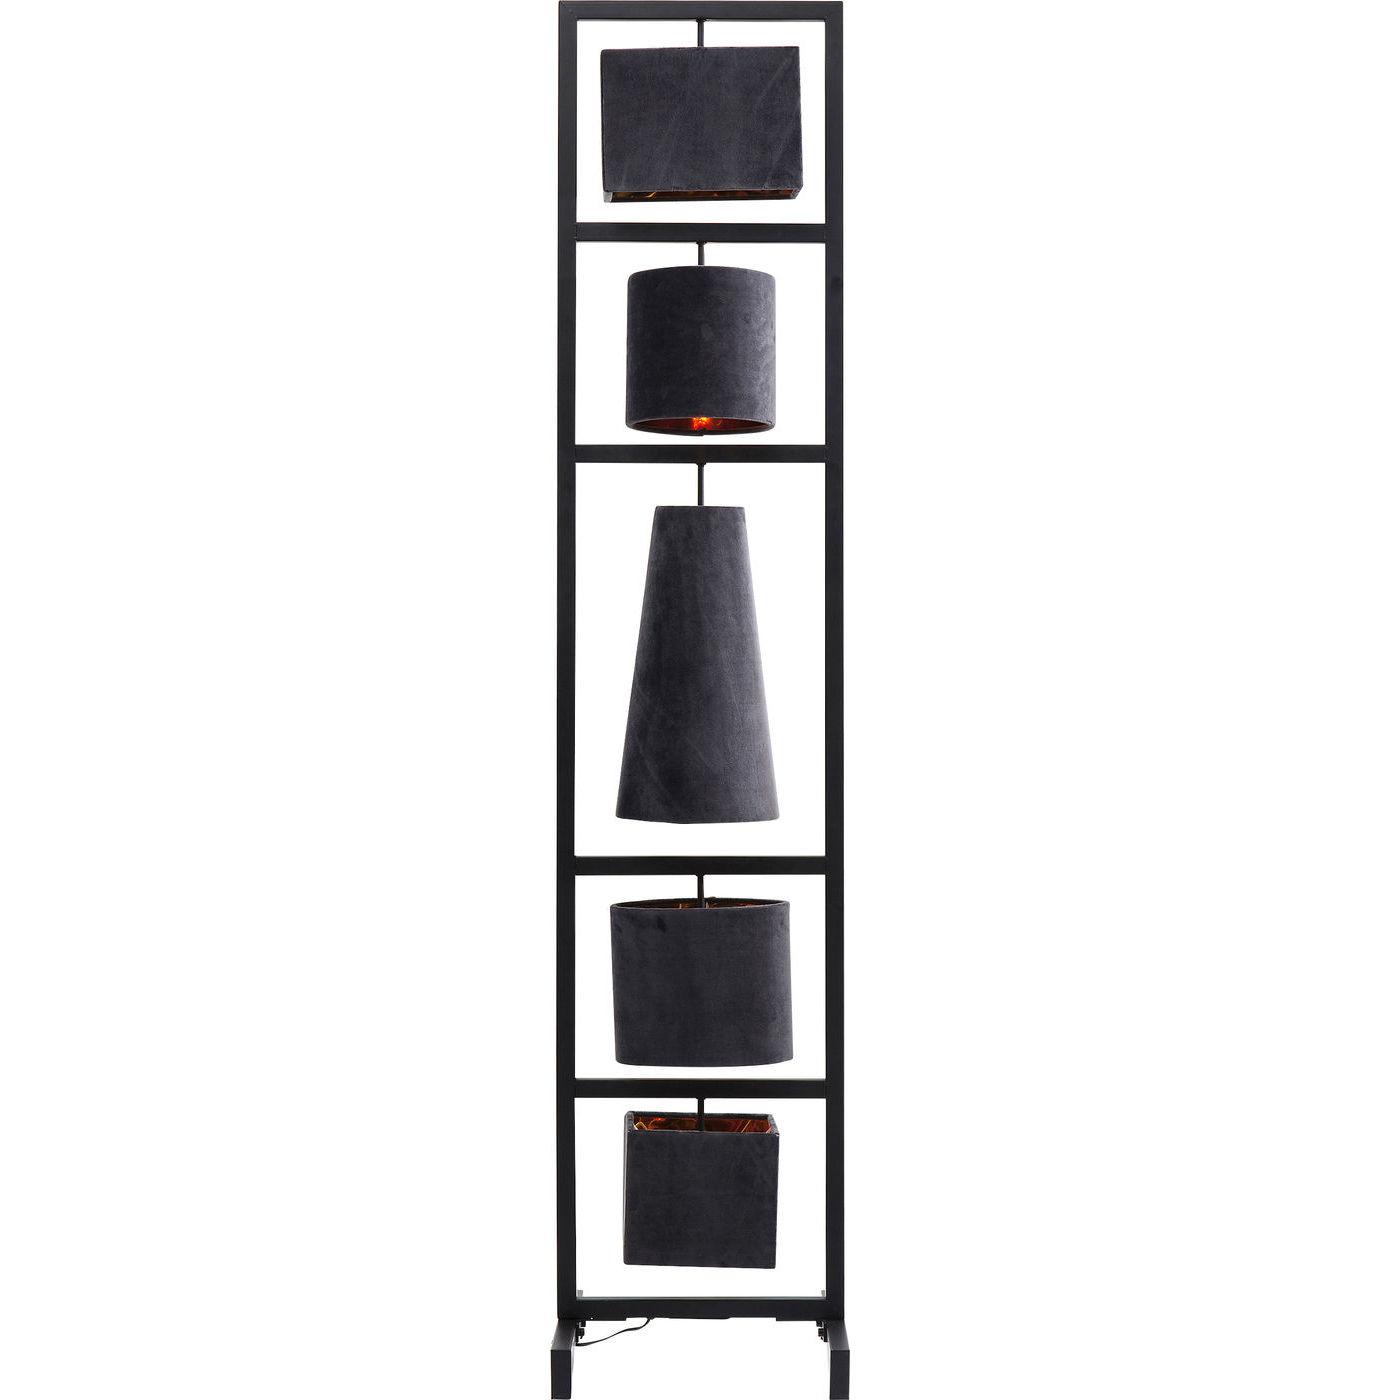 Kare design parecchi night sky gulvlampe - grå/sort stof og stål (176cm) fra kare design fra boboonline.dk